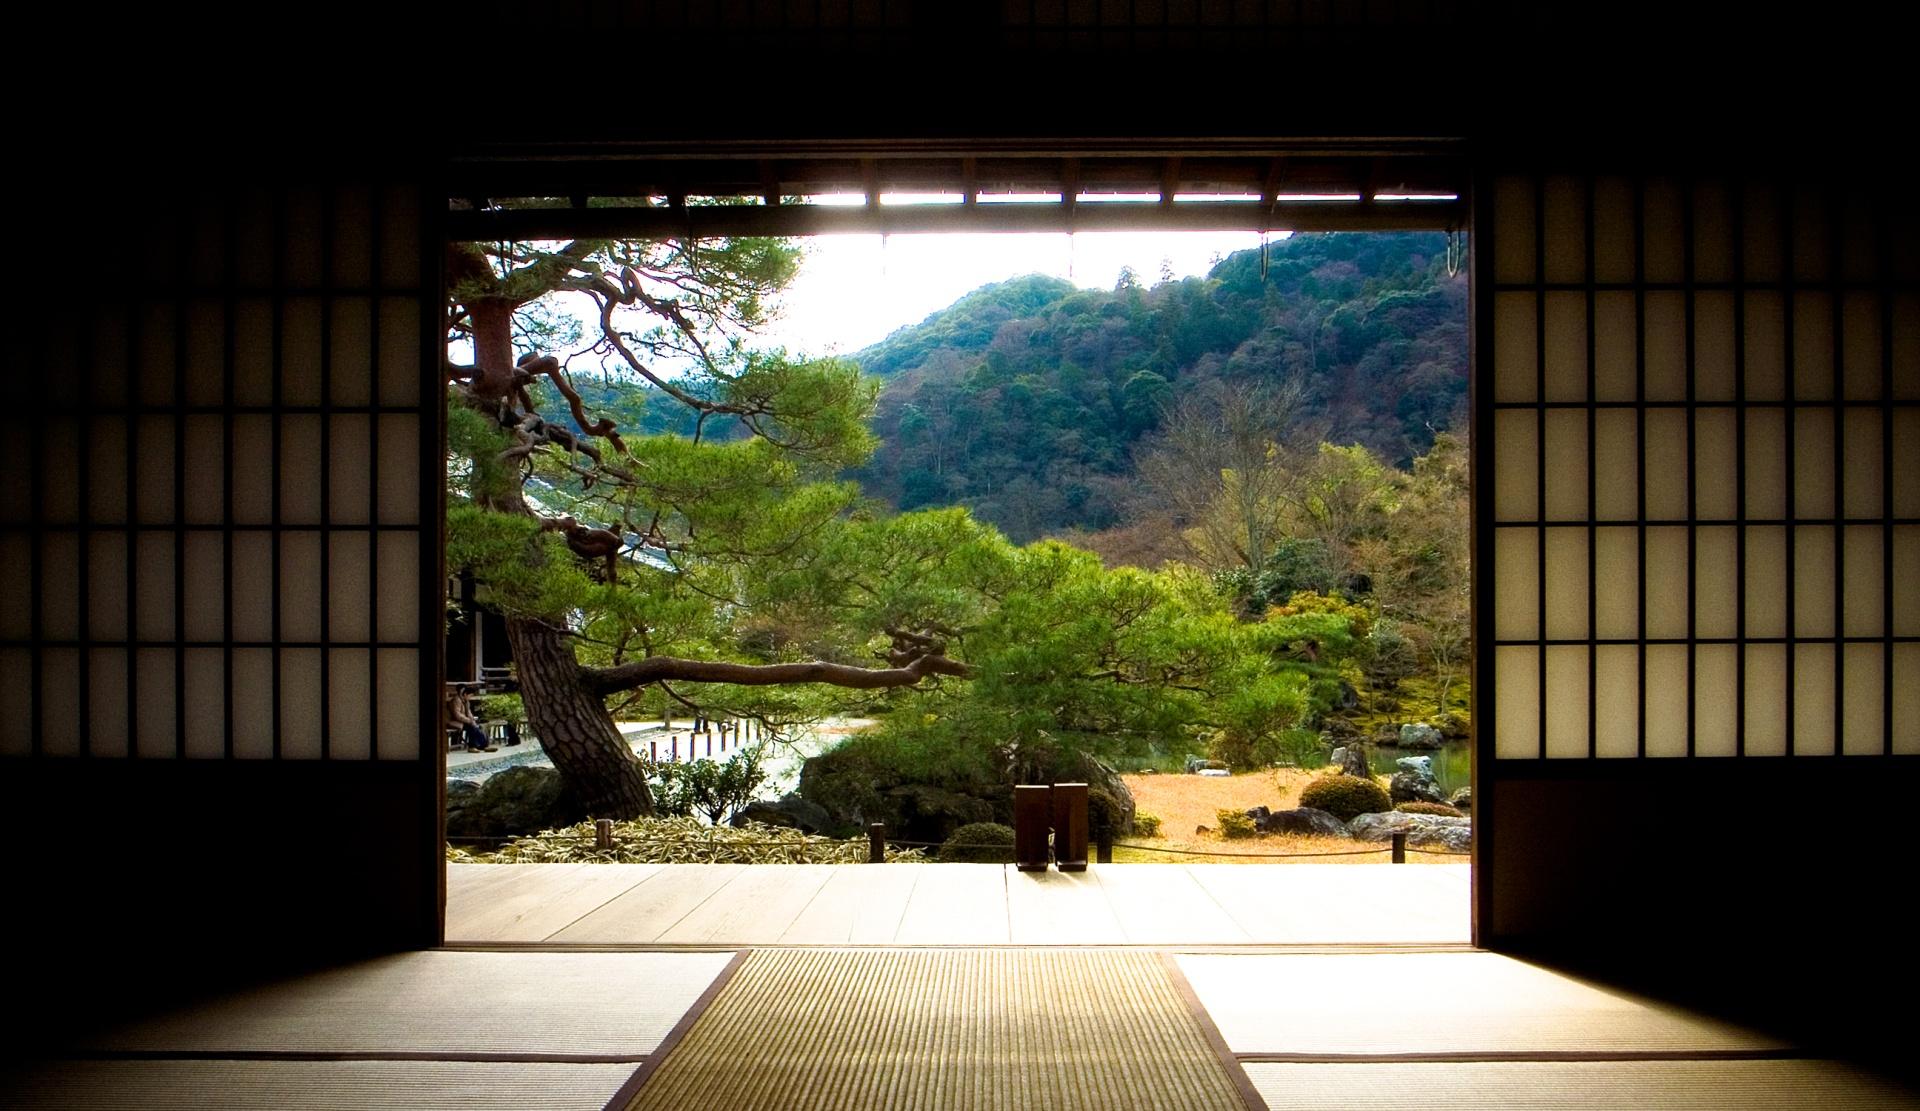 garden wallpaper zen 1920x1080px - photo #43